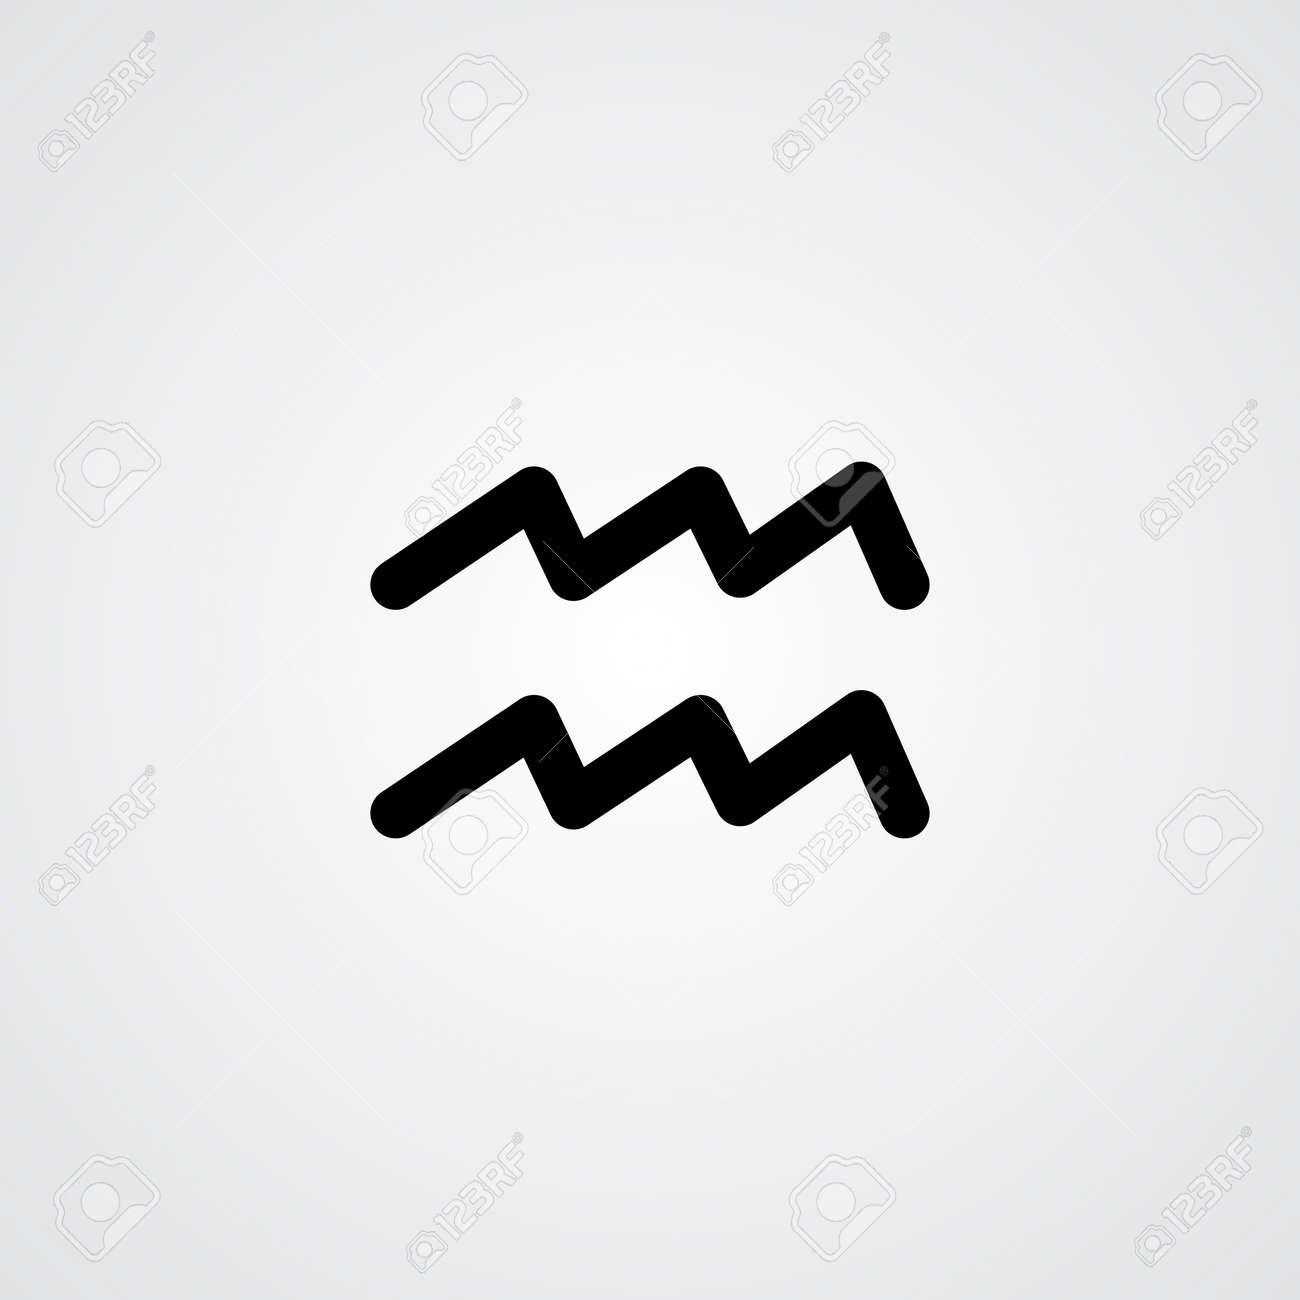 Aquarius Zodiac Symbol Black Zodiac Flat Isolated Icon On The